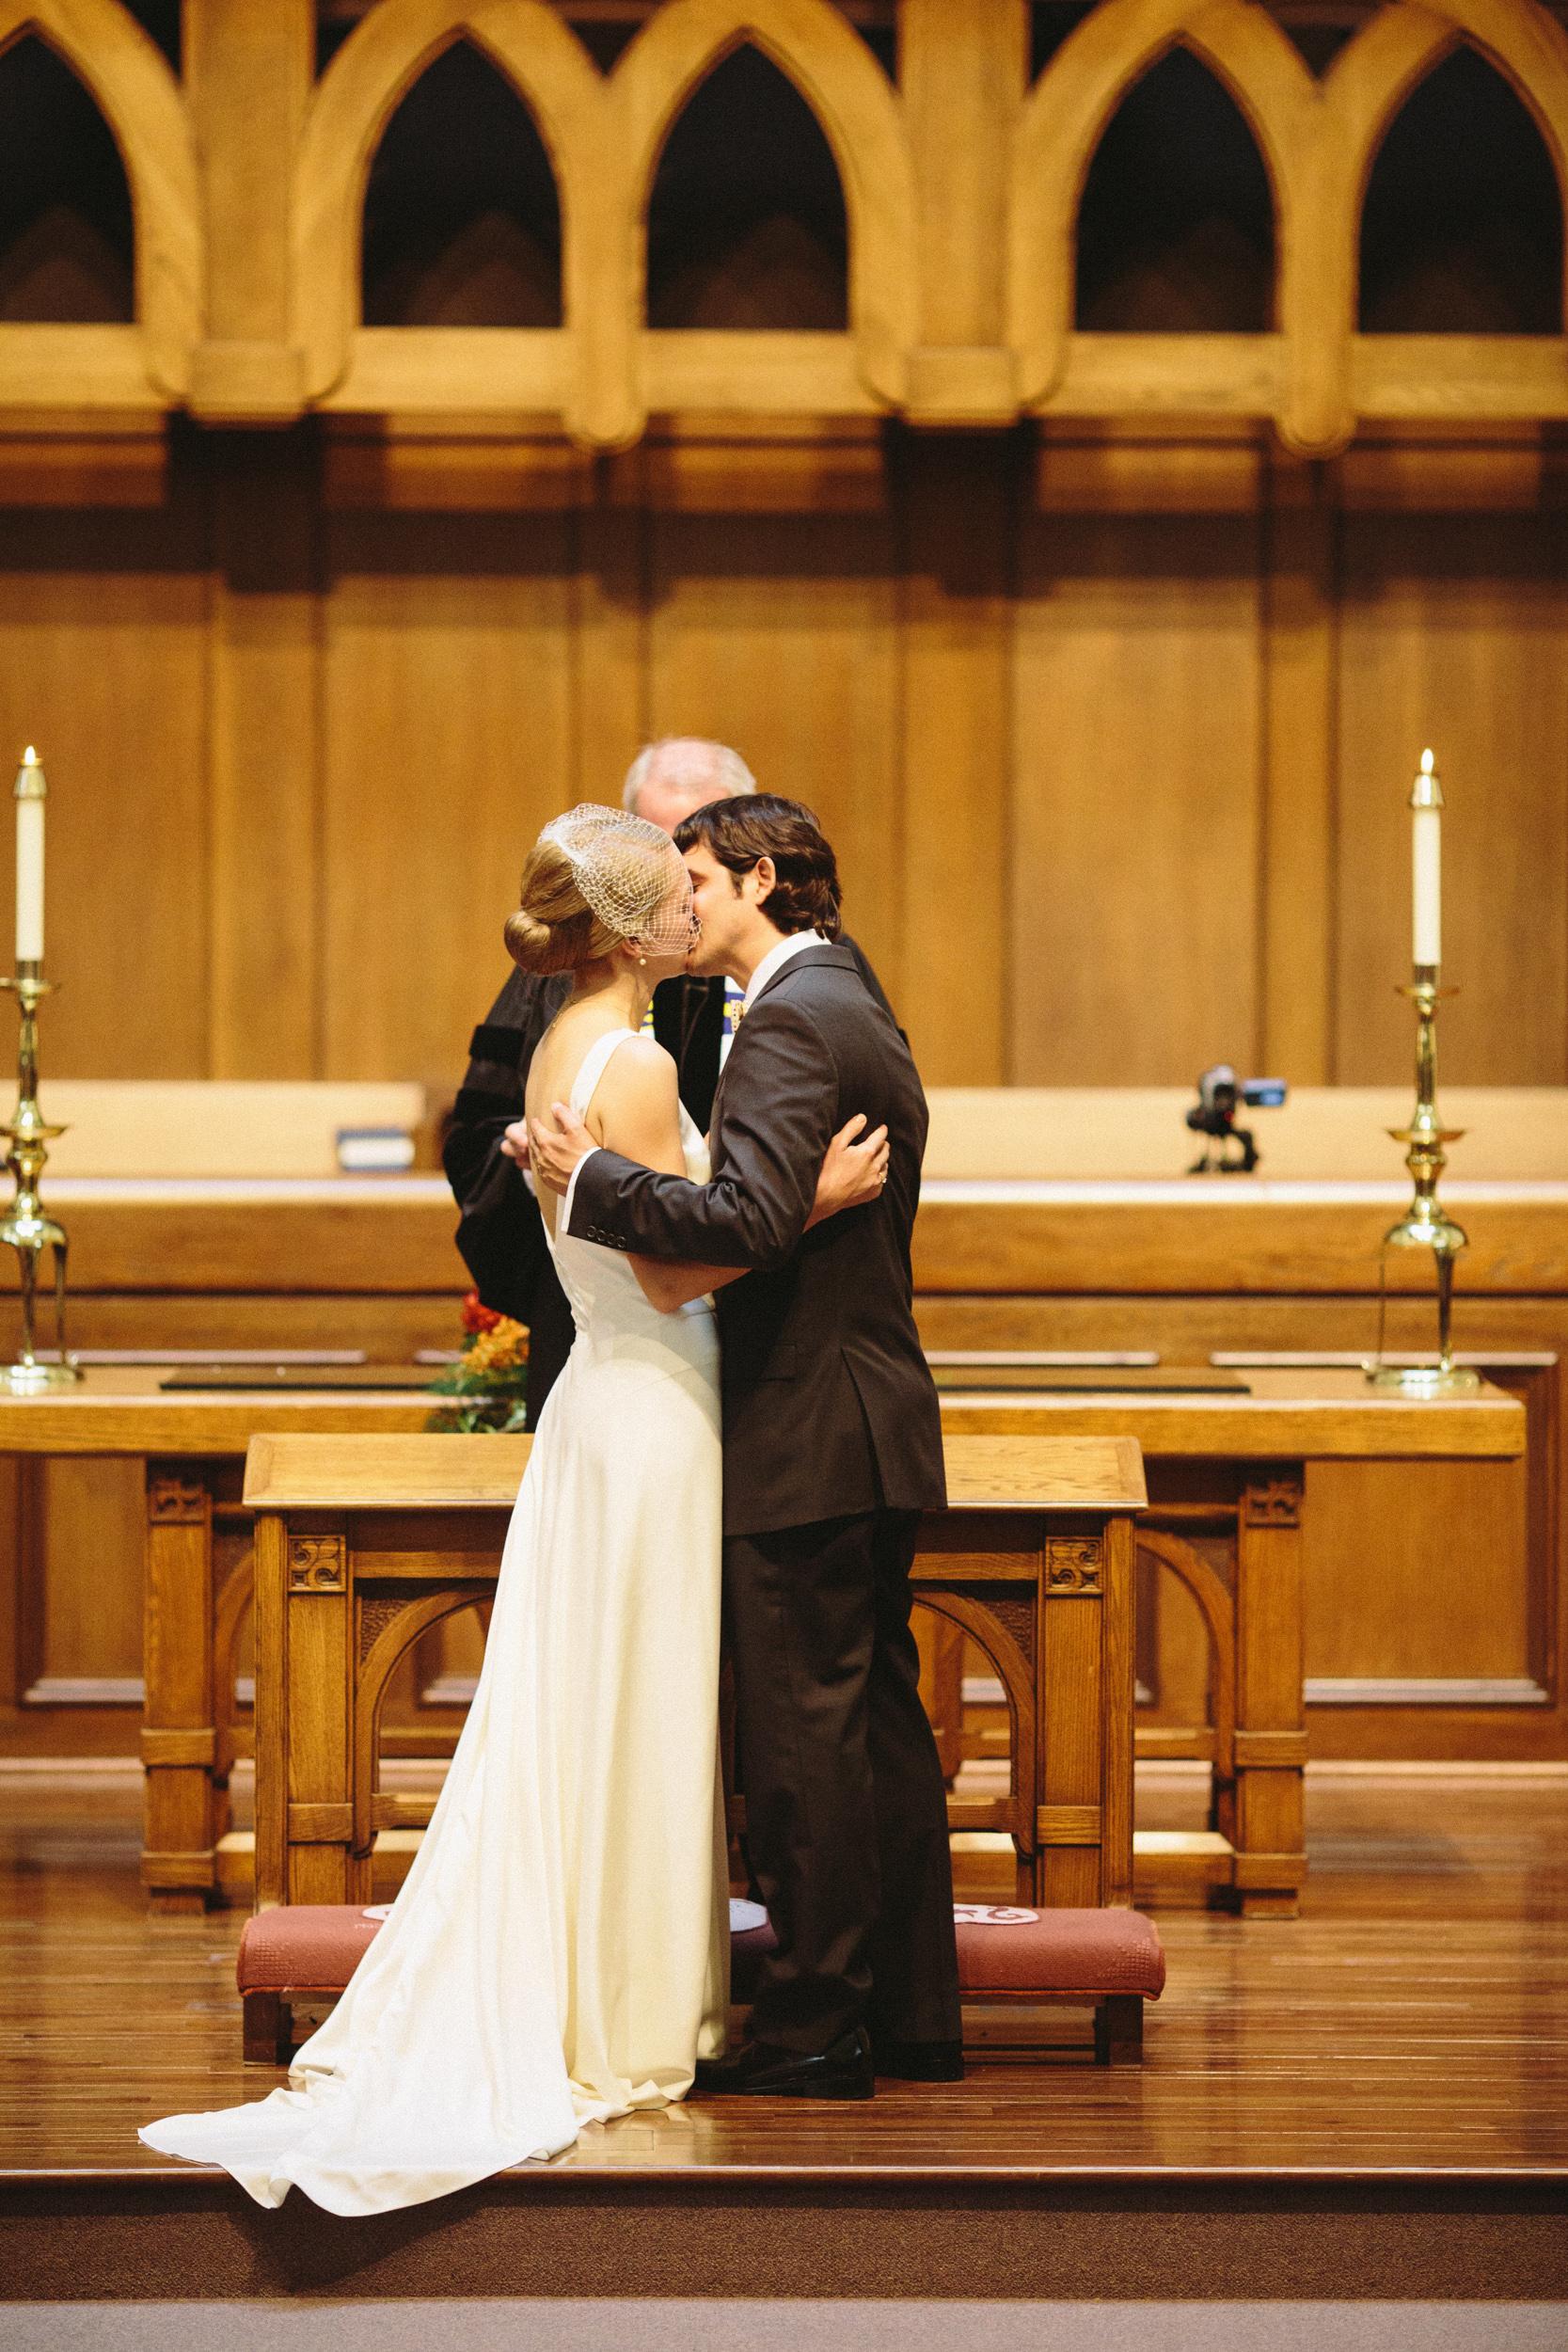 10-05-2013 maggie & adam wedding photography by brian milo-133.jpg